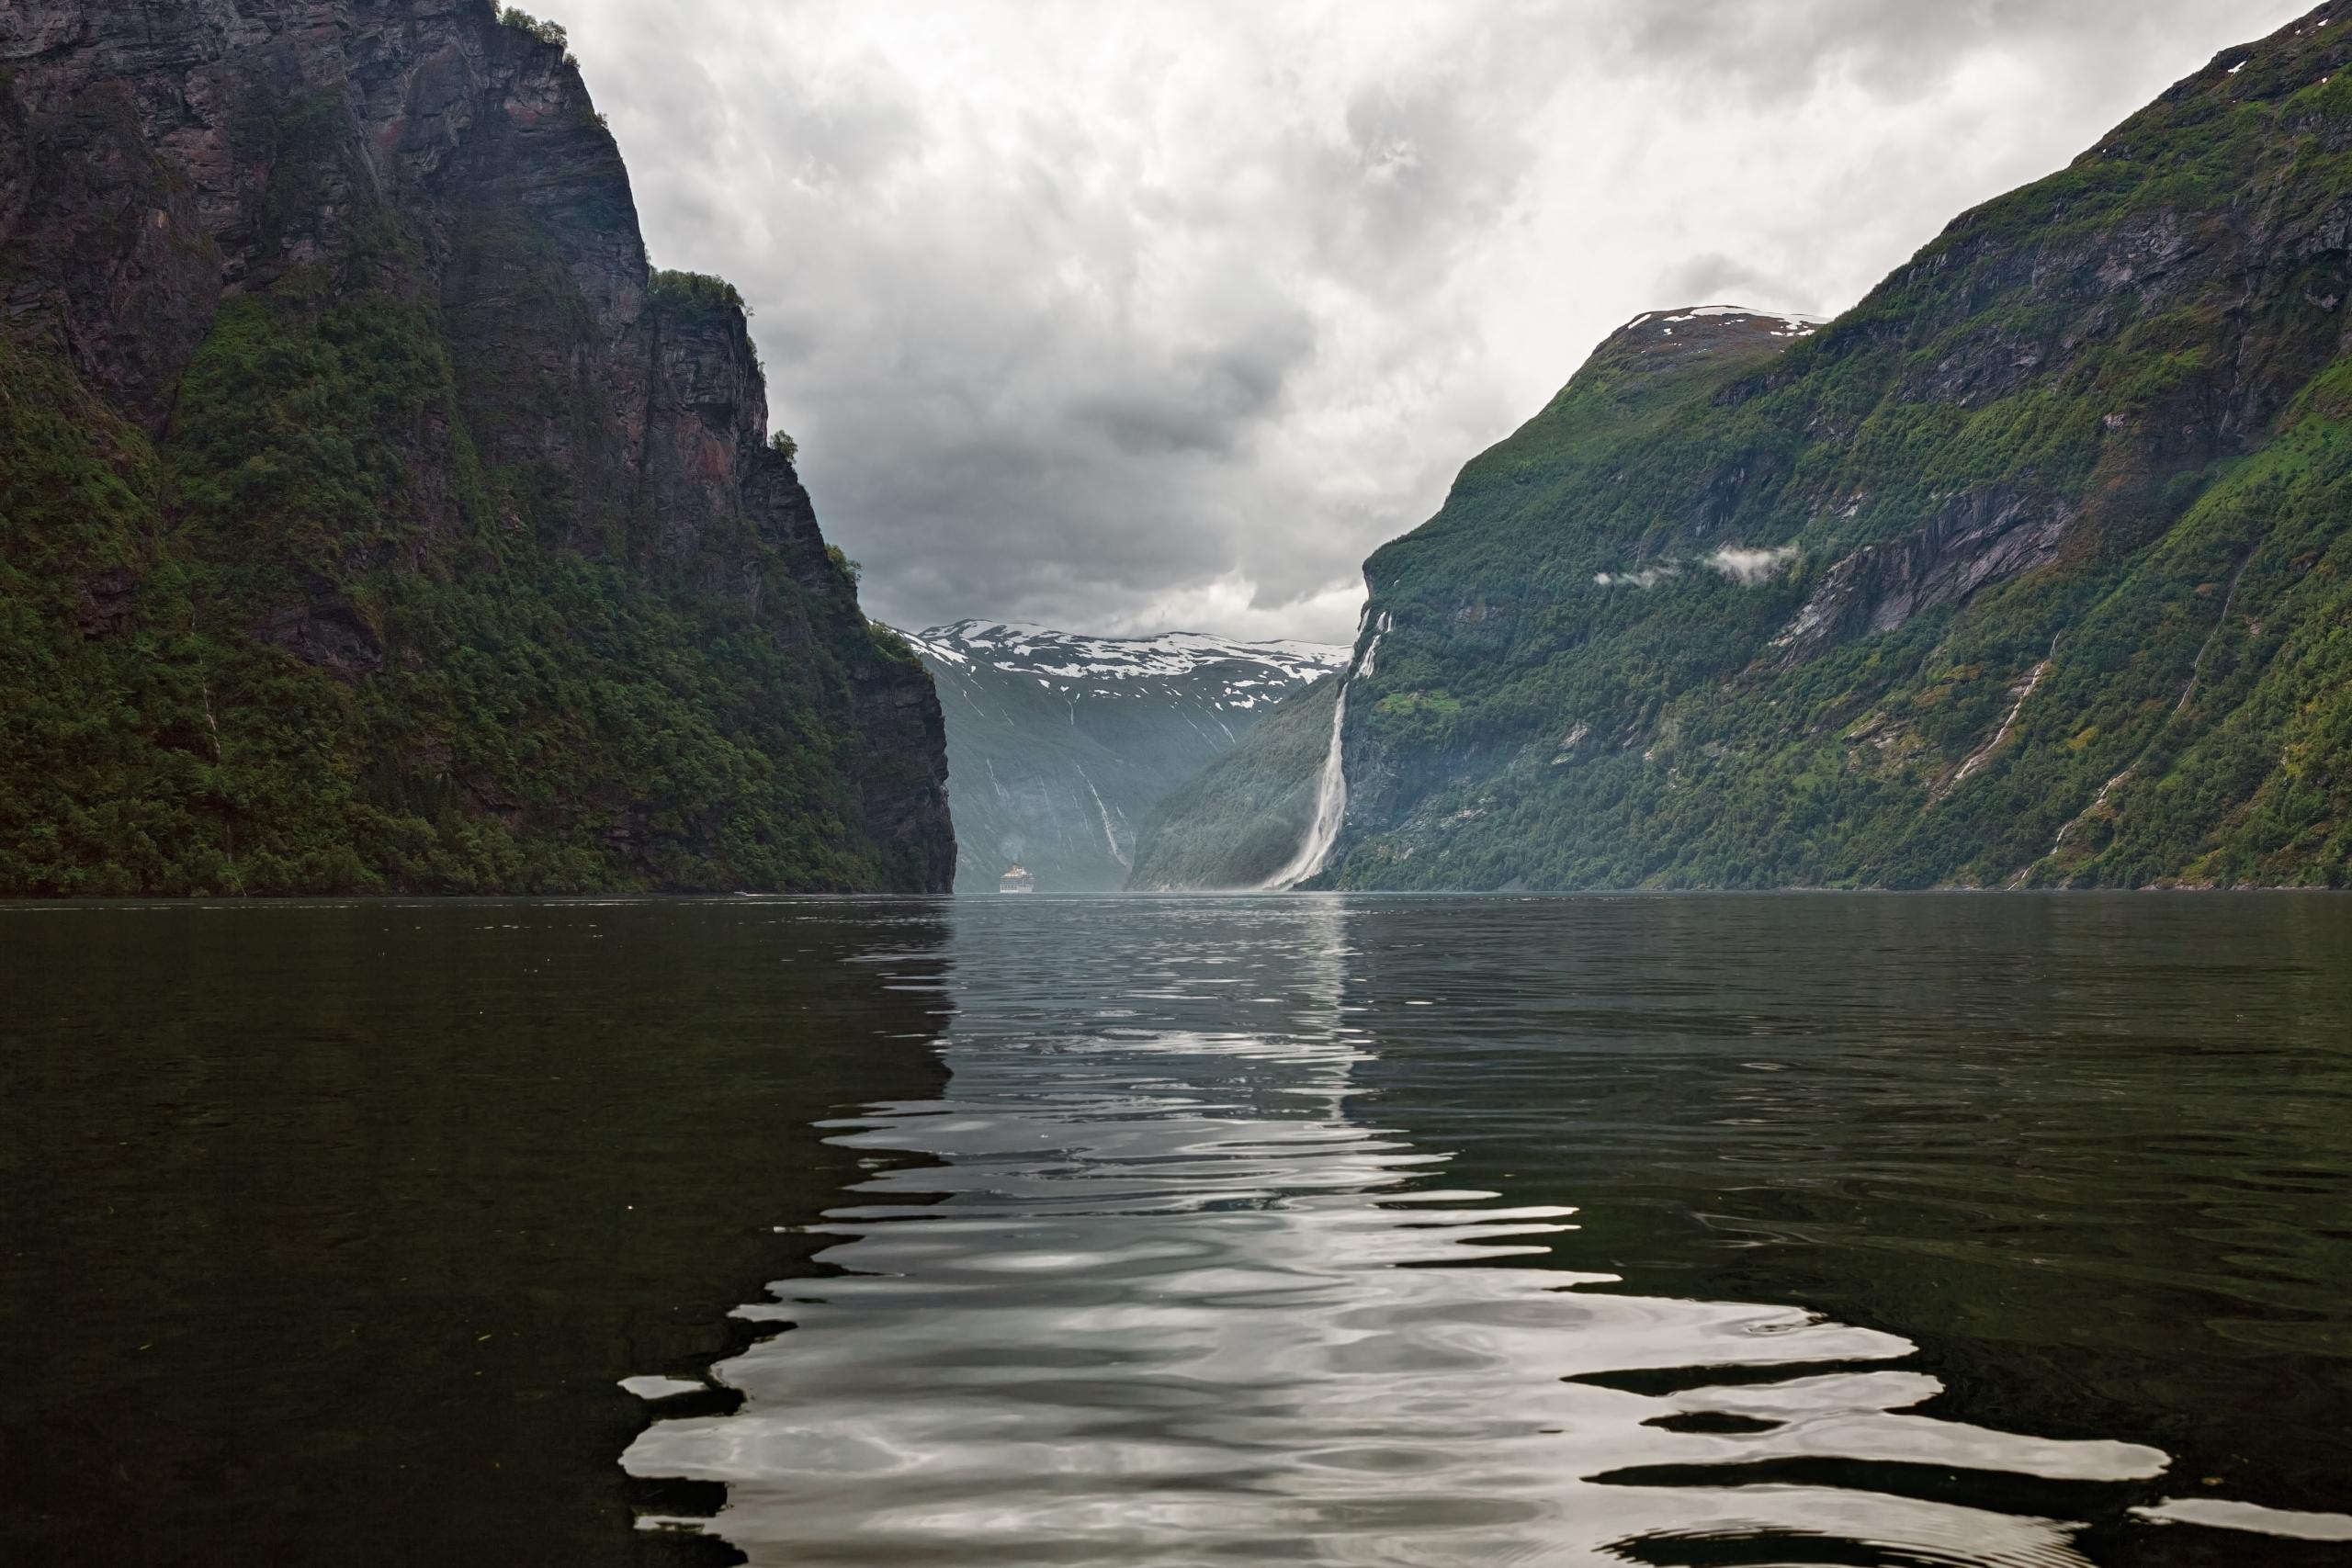 Geiranger at the end of the Sunnylvsfjorden, Norway